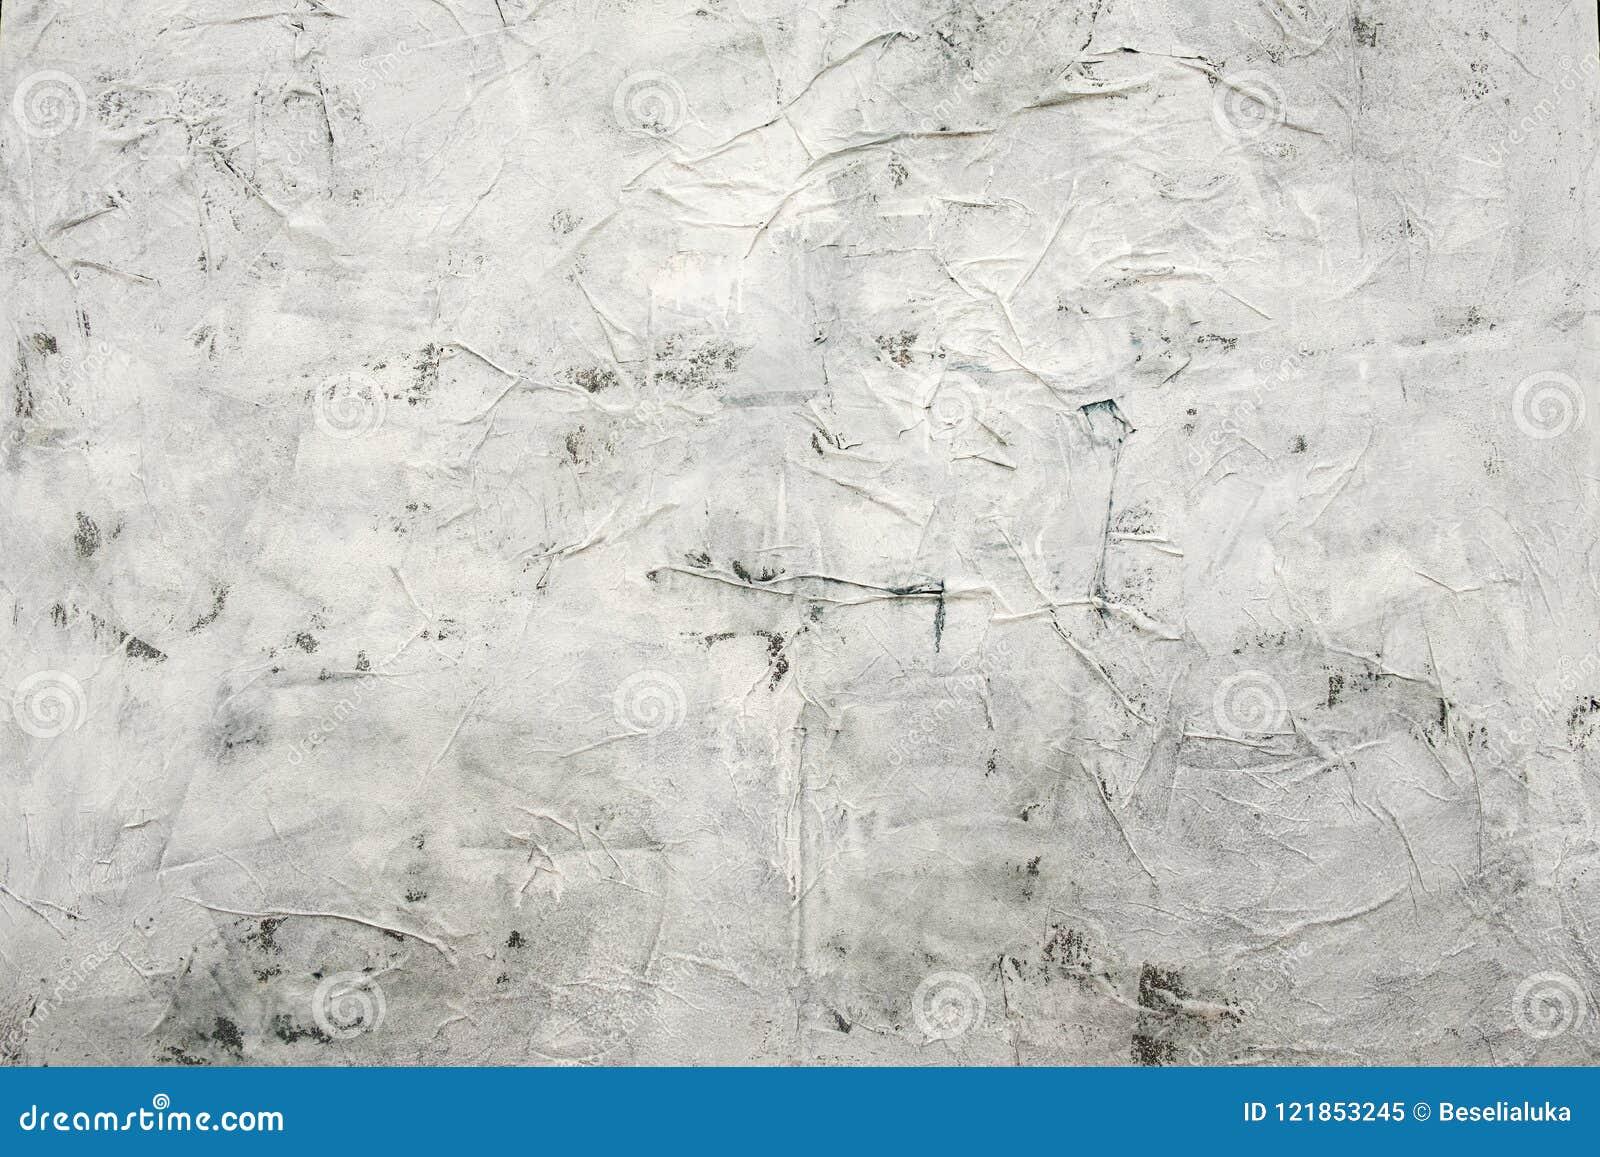 Crumpled wall background